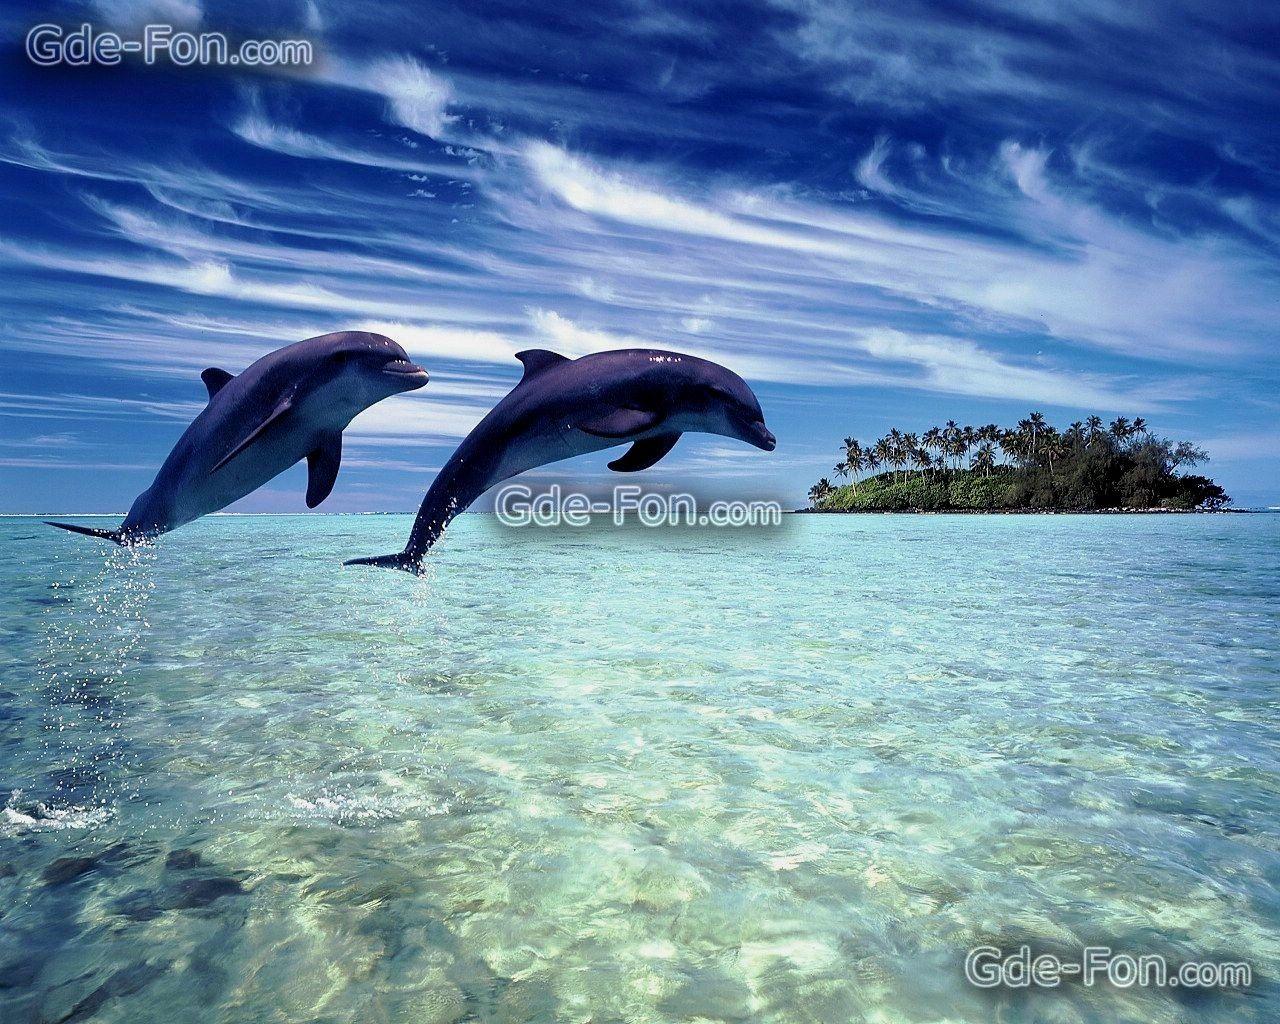 Super Images Fond Ecran 1280X1024 |  Fonds d'ecran gratuits pour  XS59